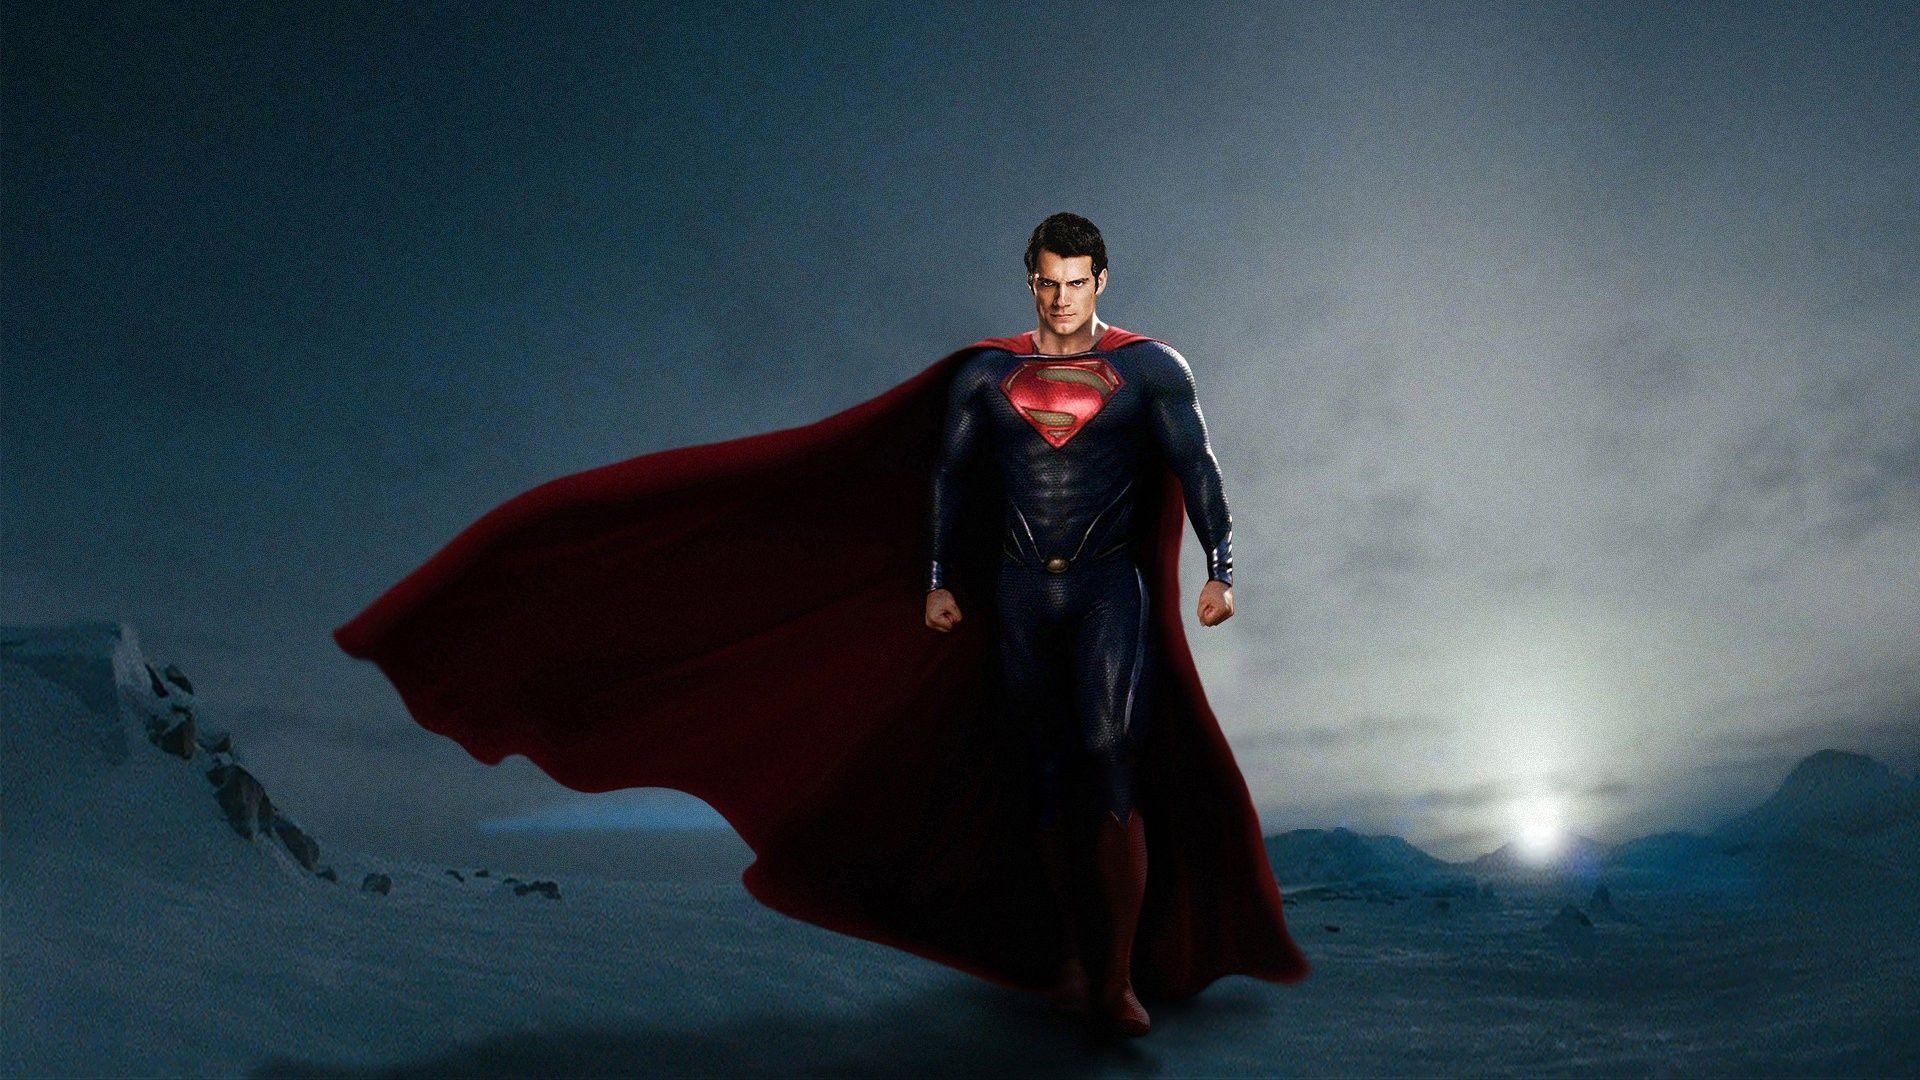 Images For Black Suit Superman Wallpaper